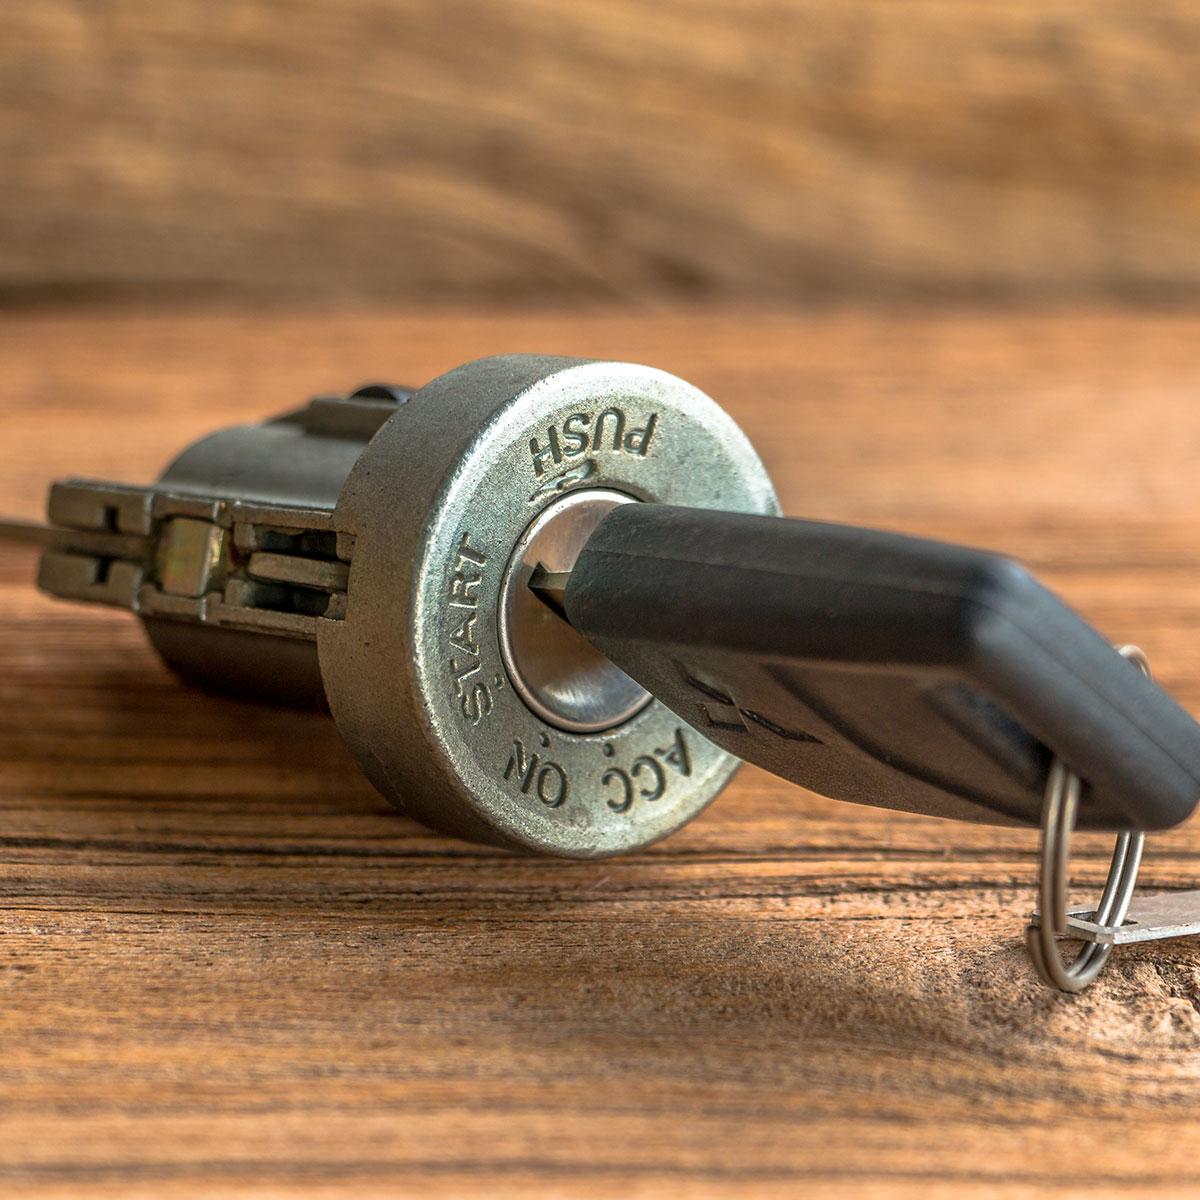 Car Ignition Switch Replacement Costs Repairs Autoguru